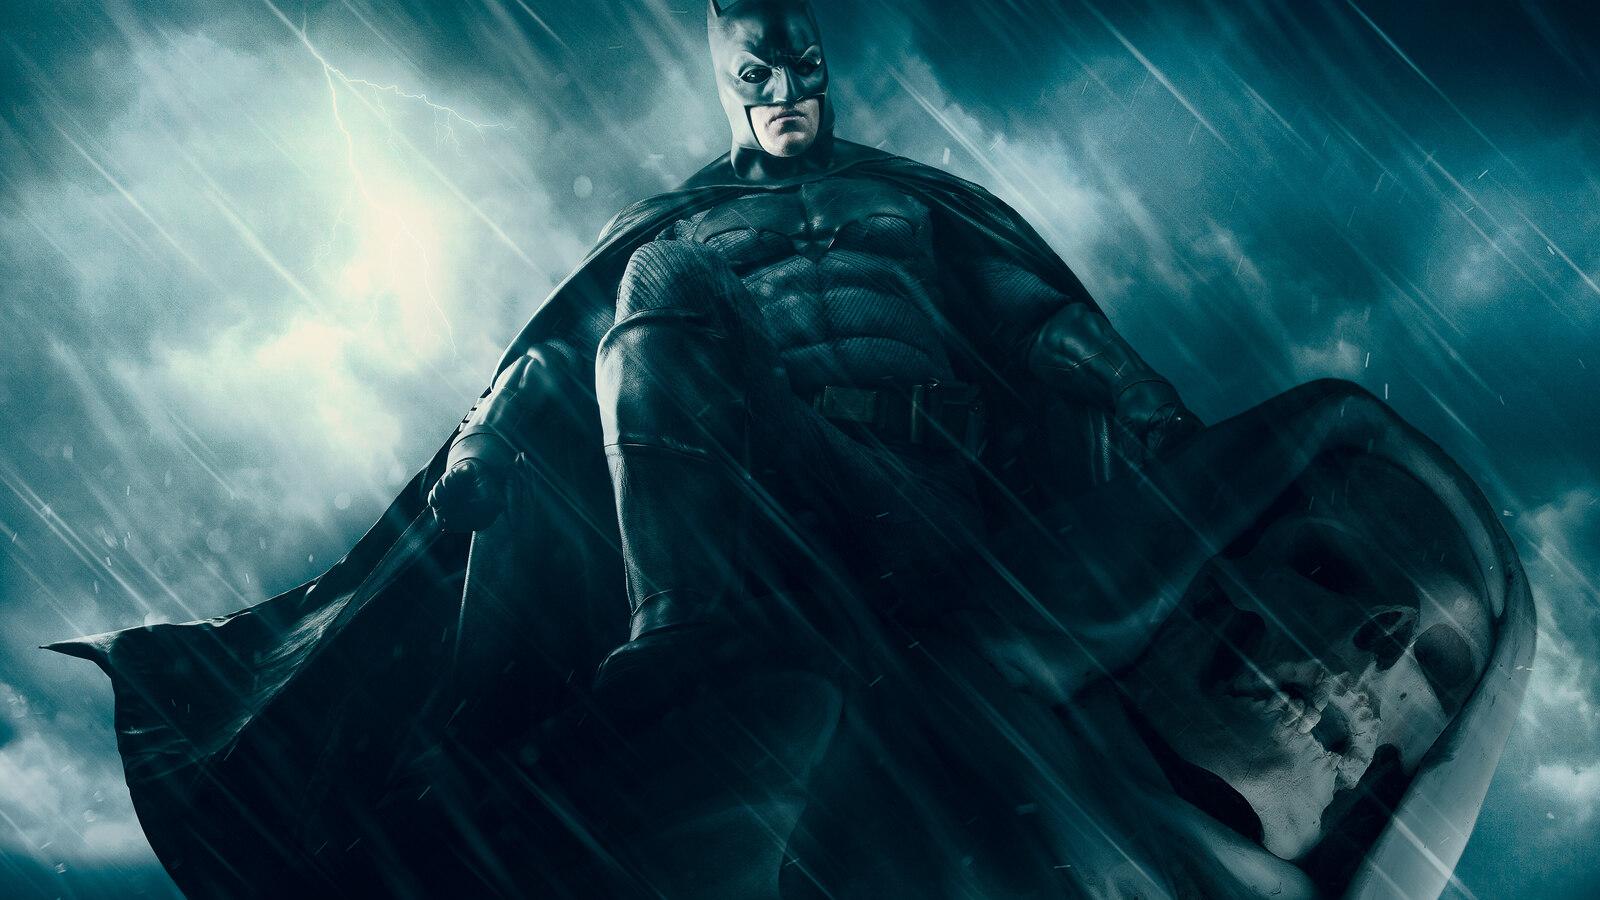 batman-4k-dark-knight-m6.jpg